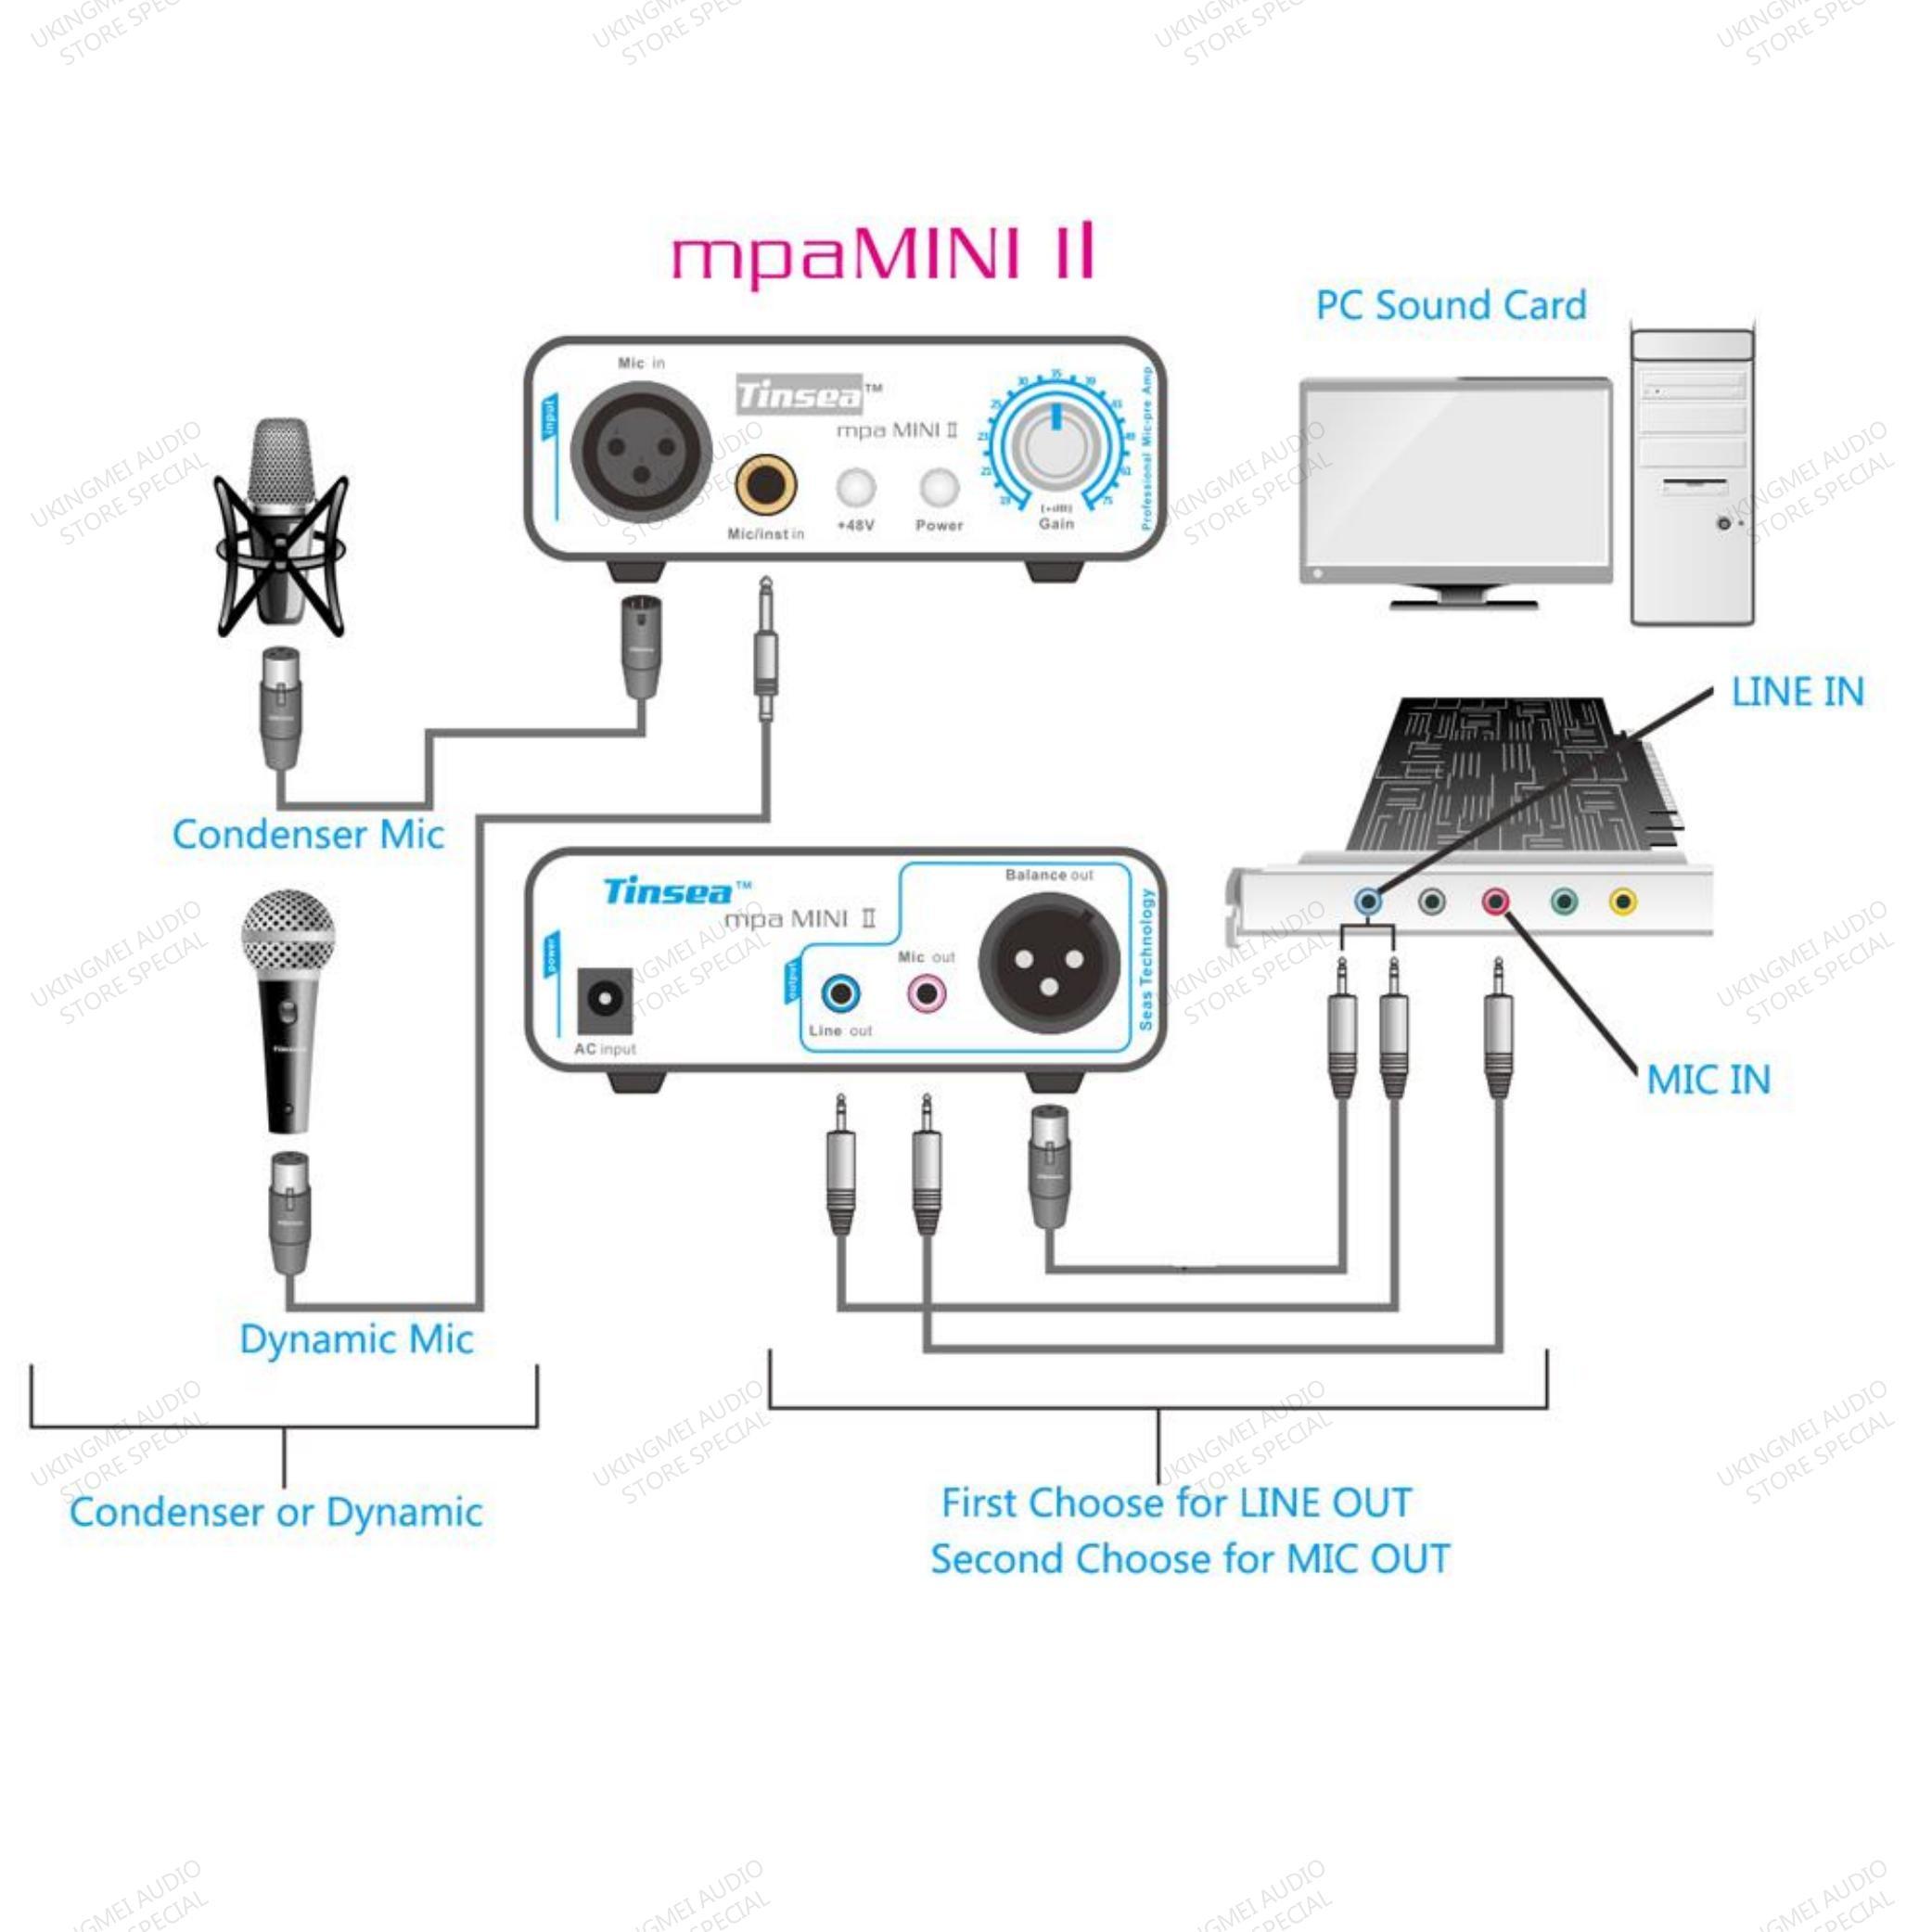 Tinsea mpa MINI2 Profession Mic-pre Amp for livestream sound card reverberation karaoke for live broadcasting vocal for SM58 enlarge